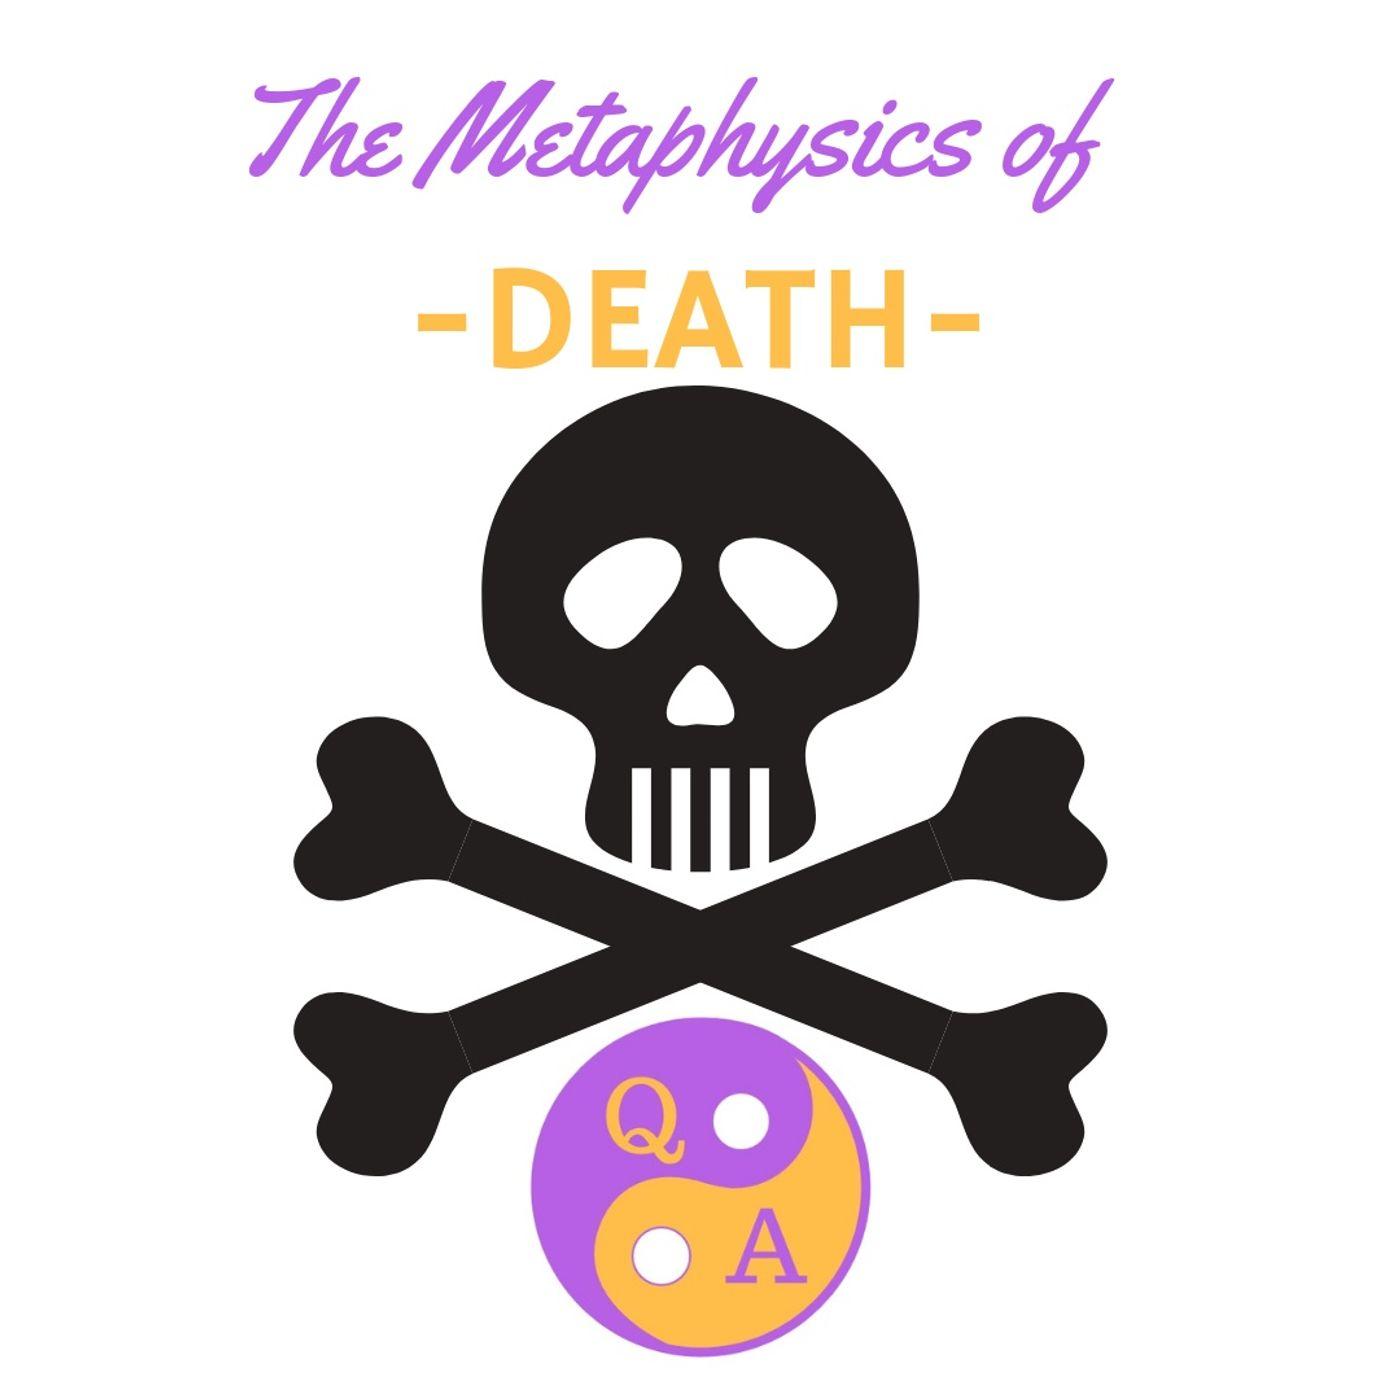 Metaphysics of Death